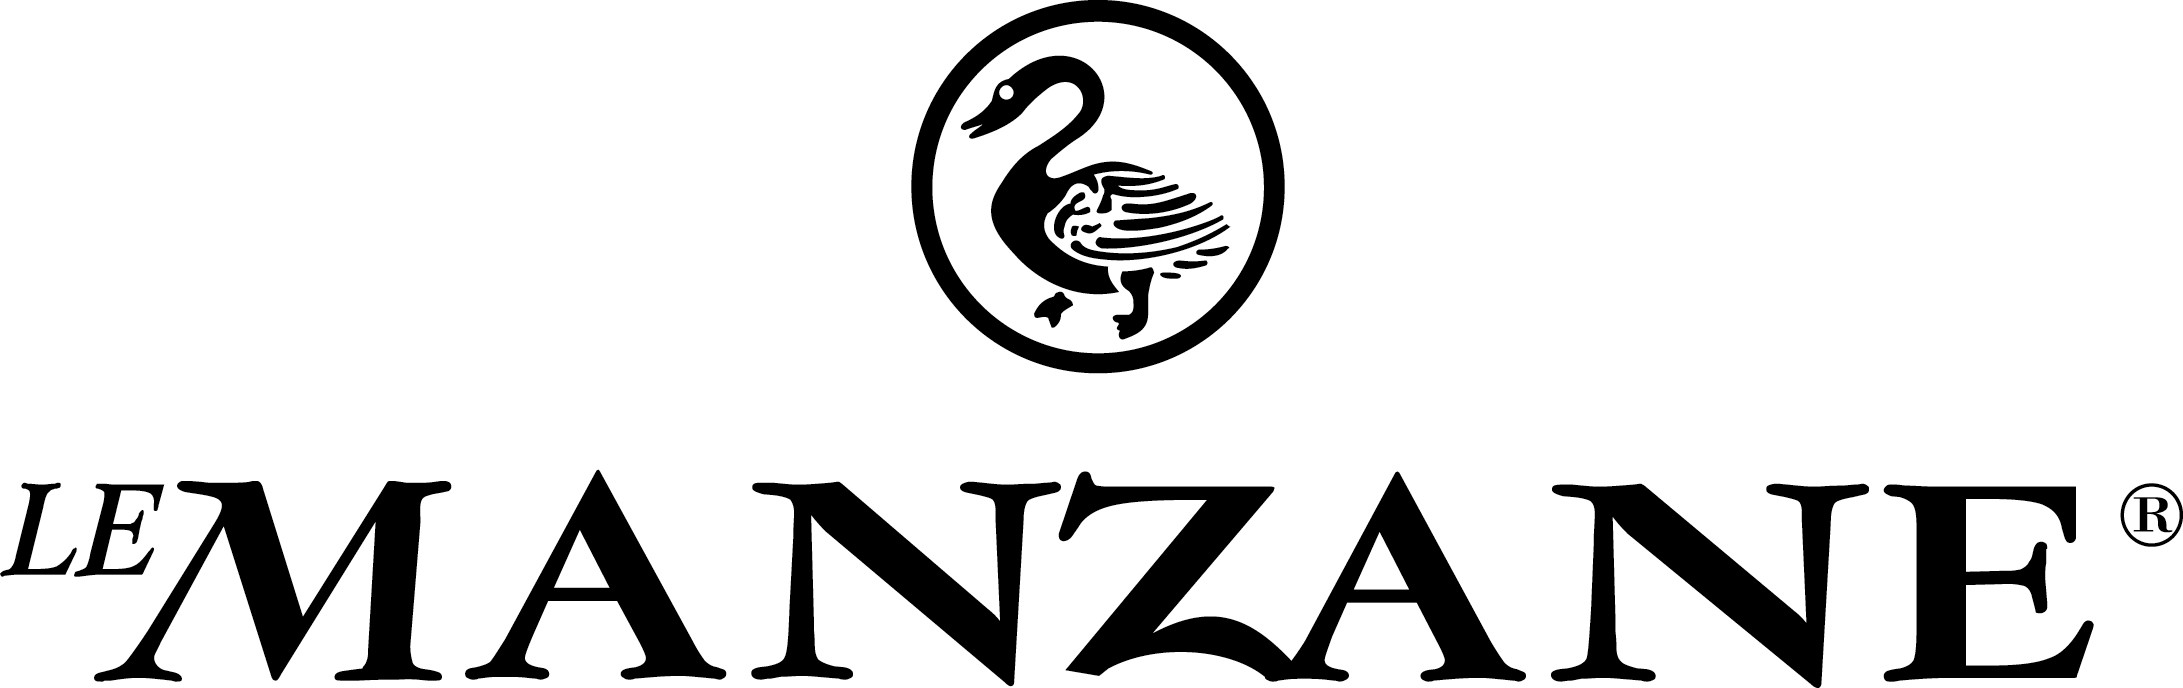 Logo Le Manzane